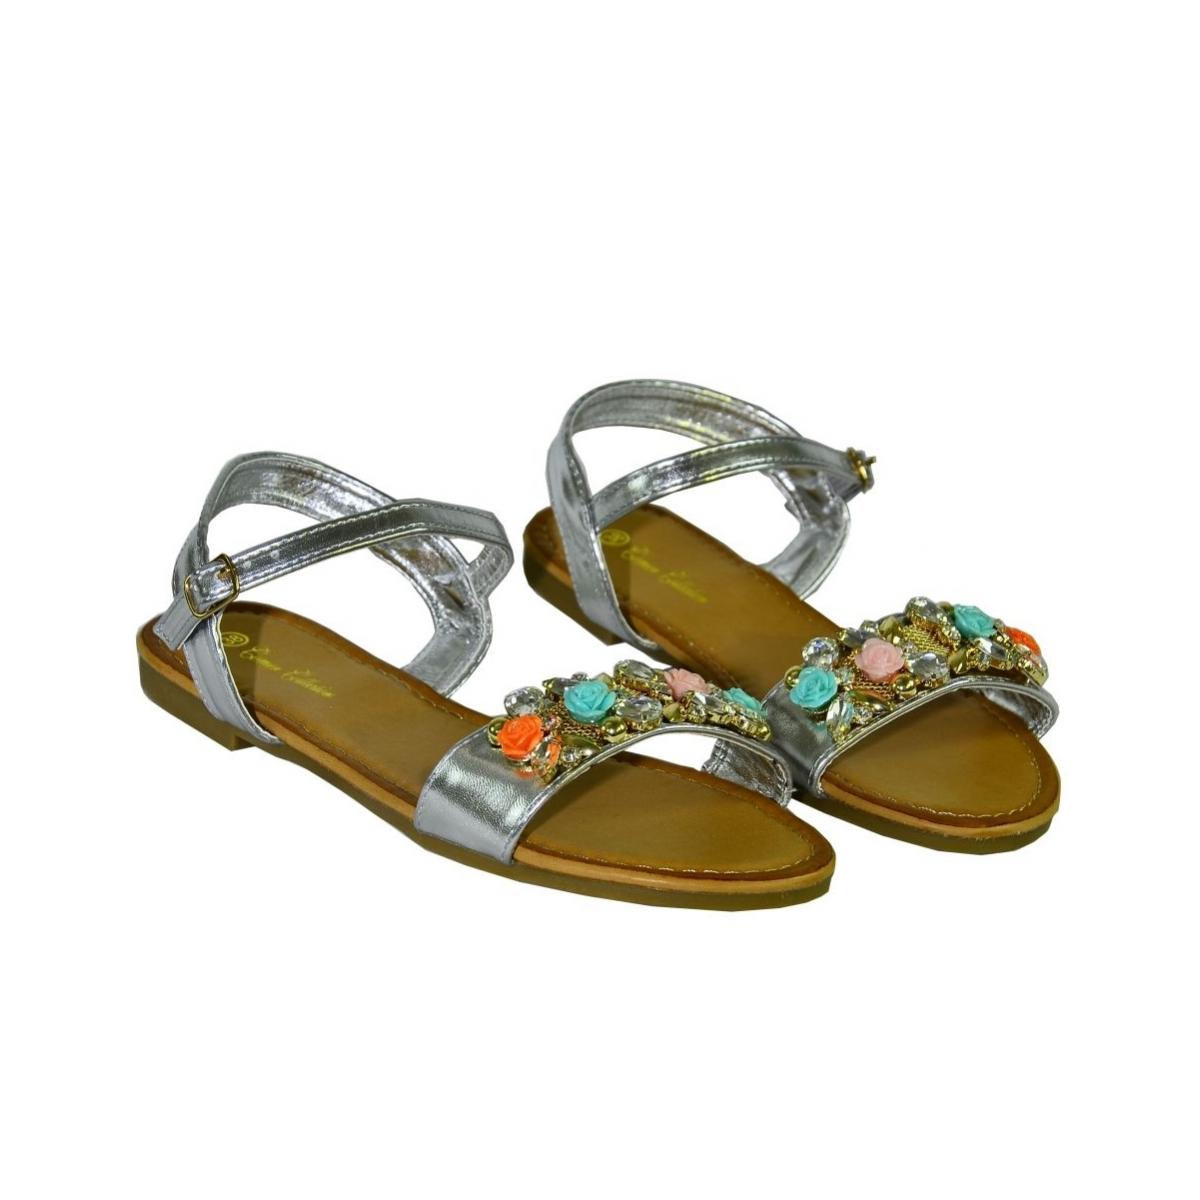 4aa6be1db803 Strieborné nízke sandále s kvietkami SAGE - 3